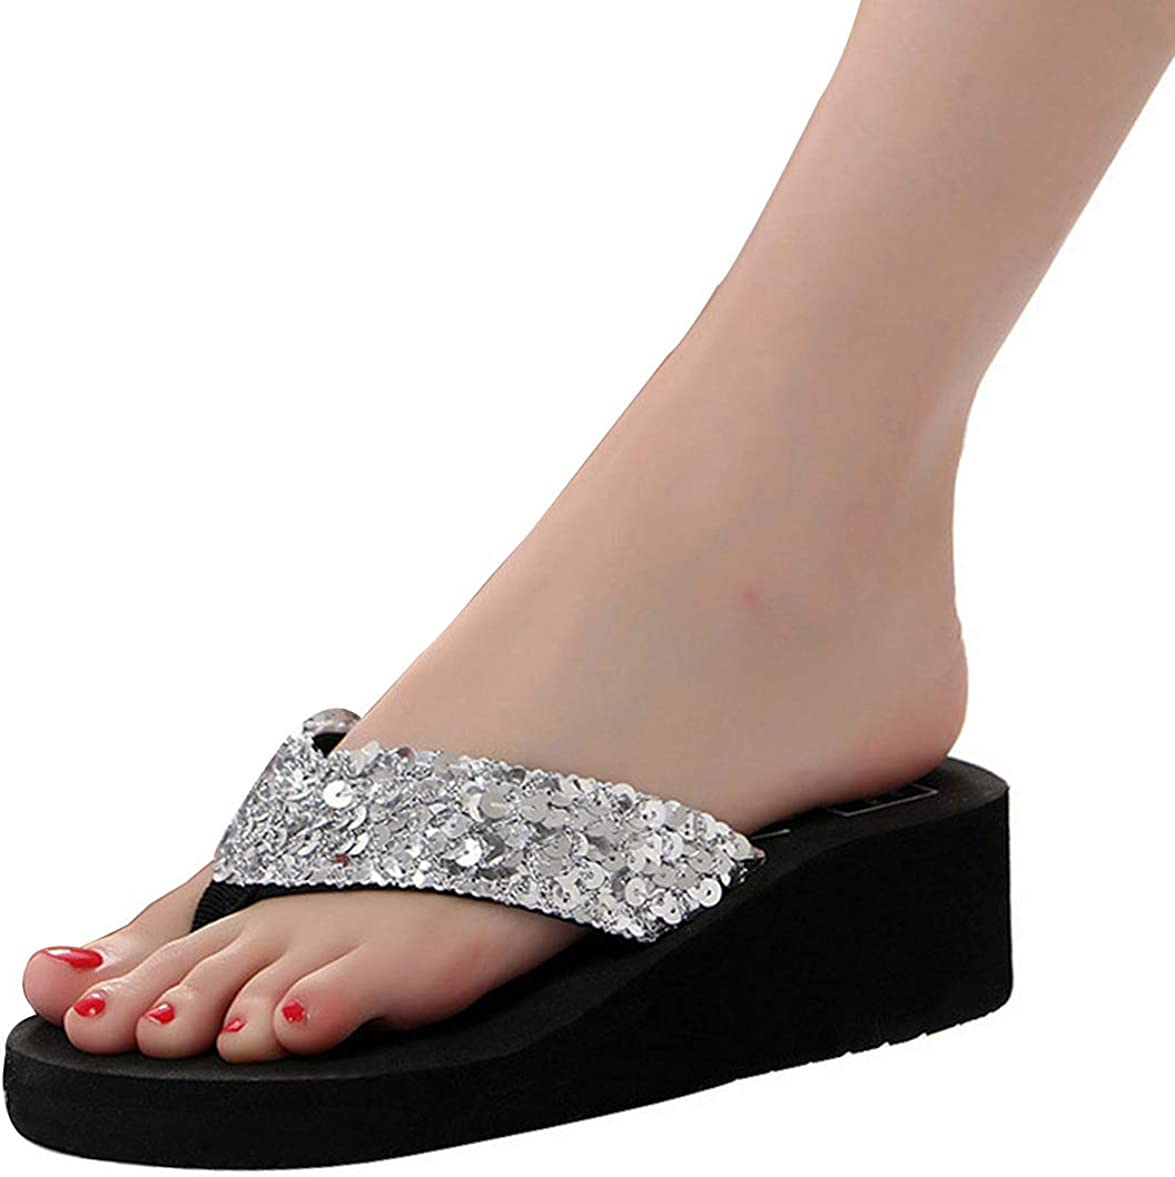 Sequins Women Shoes Beach Slippers Flip Flops Sandalias Plataforma Women Wedges Sandals Silver Flip Flops